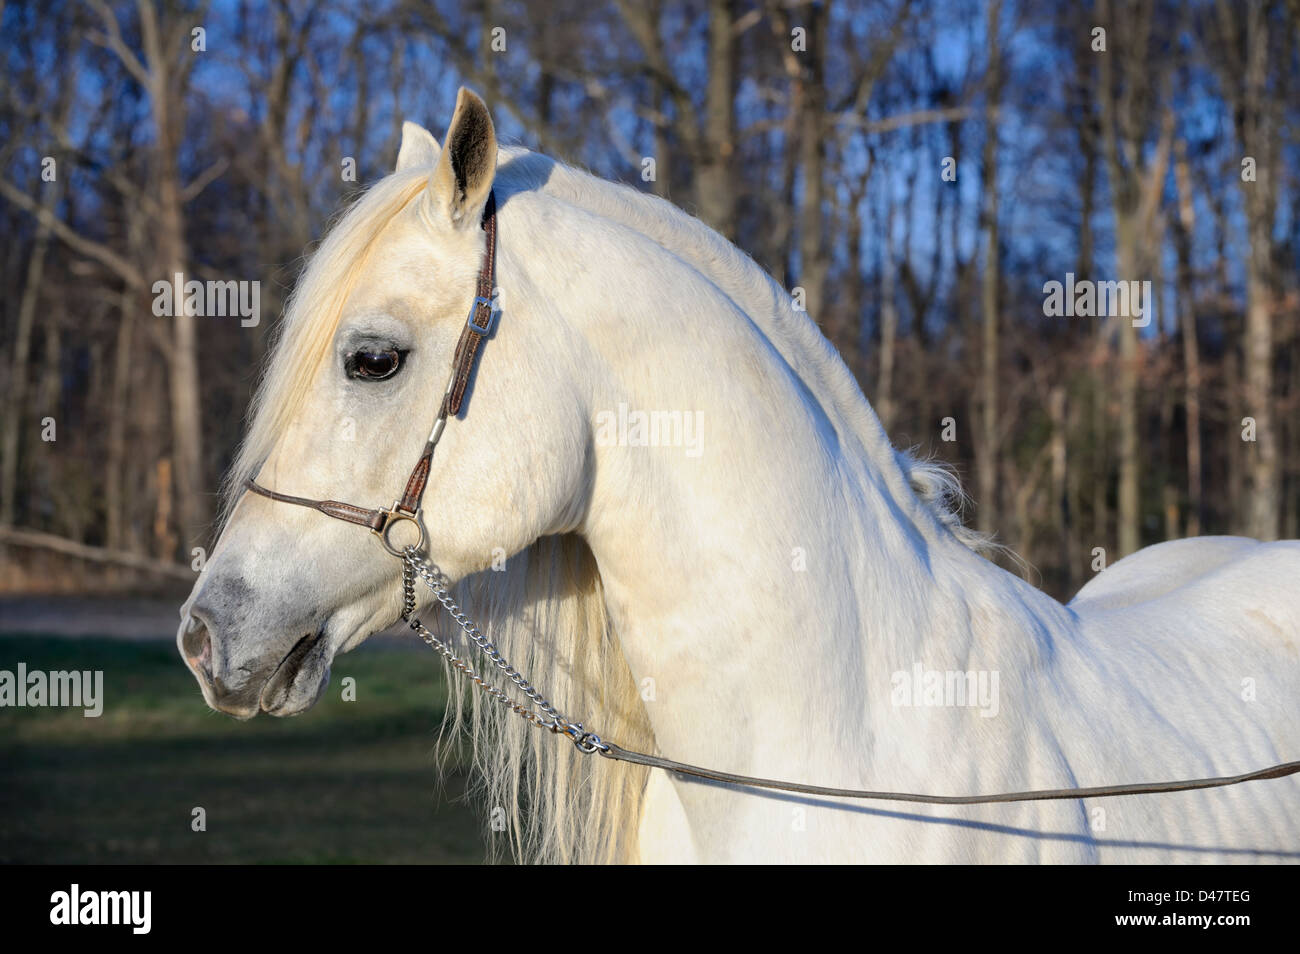 White horse head shot with long full mane hair in side view, Arabian stallion taken in the last evening light of - Stock Image